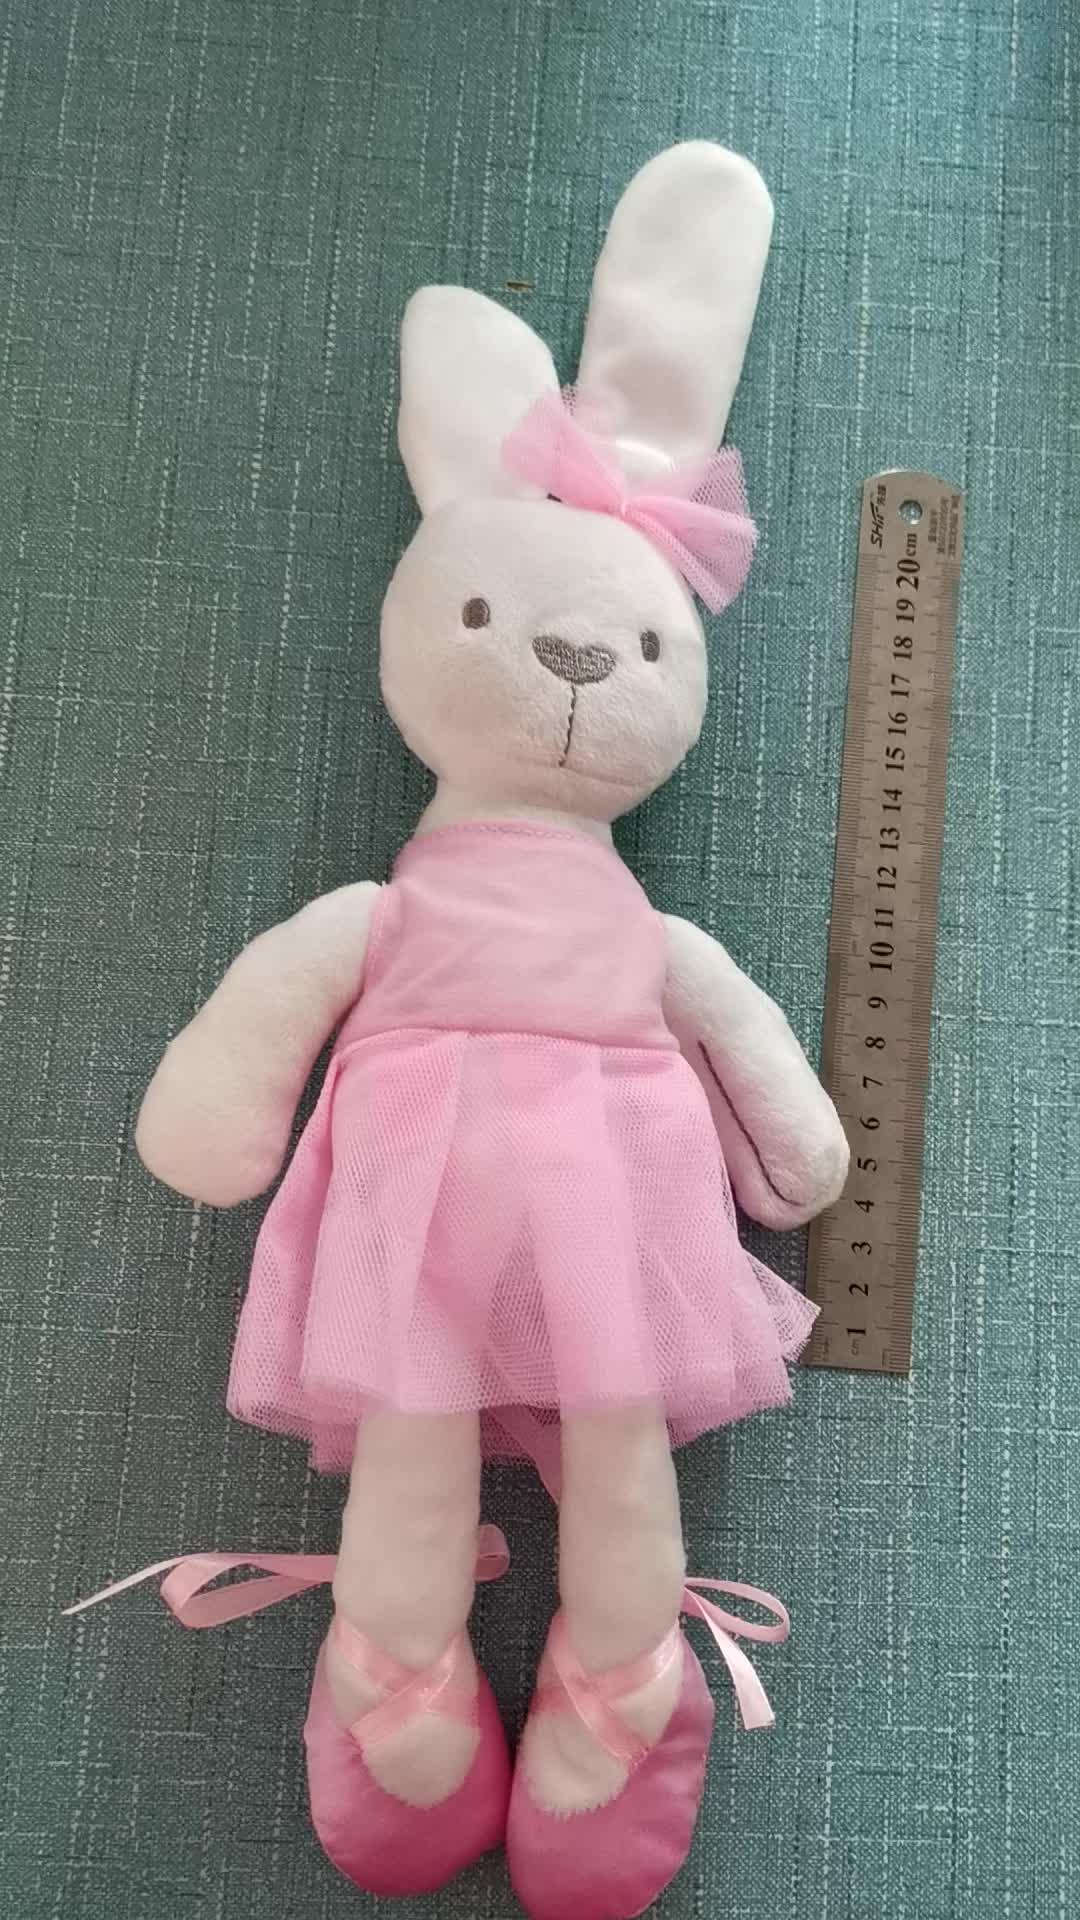 45 Cm Besar Lembut Hewan Mewah Kelinci Kelinci Mainan Anak Bayi Perempuan Anak Laki-laki Tidur Boneka Hewan Peliharaan Mainan Brinquedos